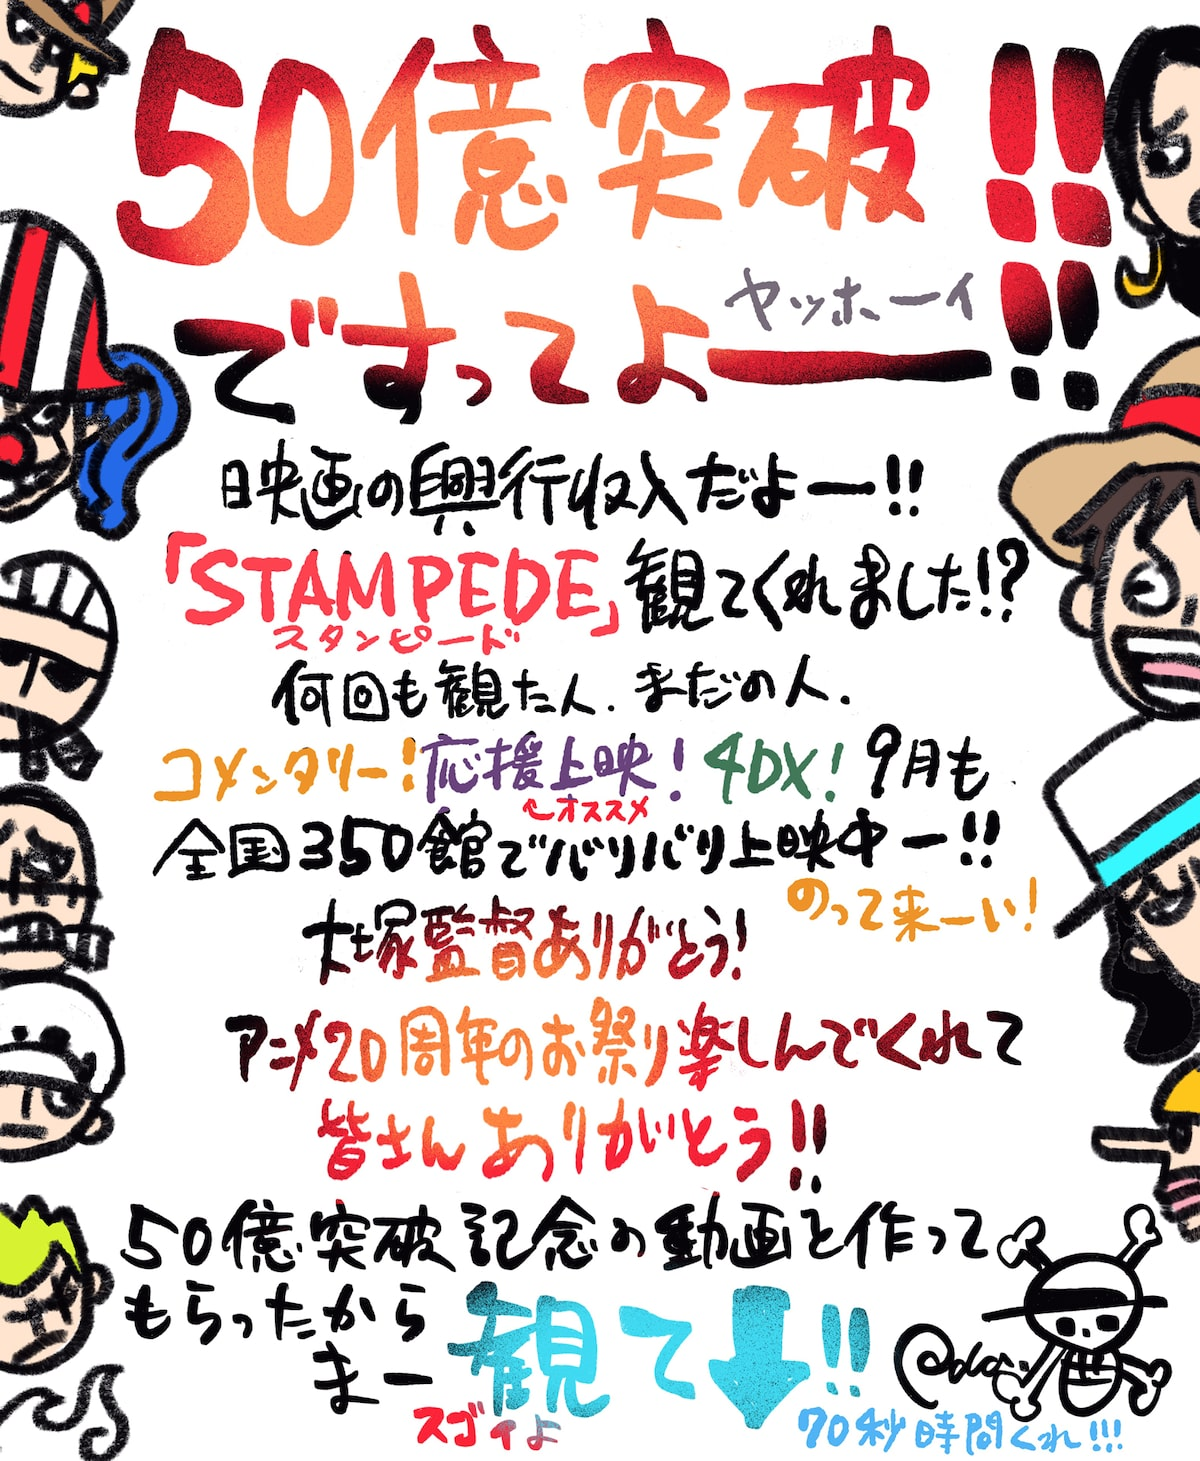 ONE PIECE STAMPEDE」尾田栄一郎が監修した特別映像公開、直筆コメント ...